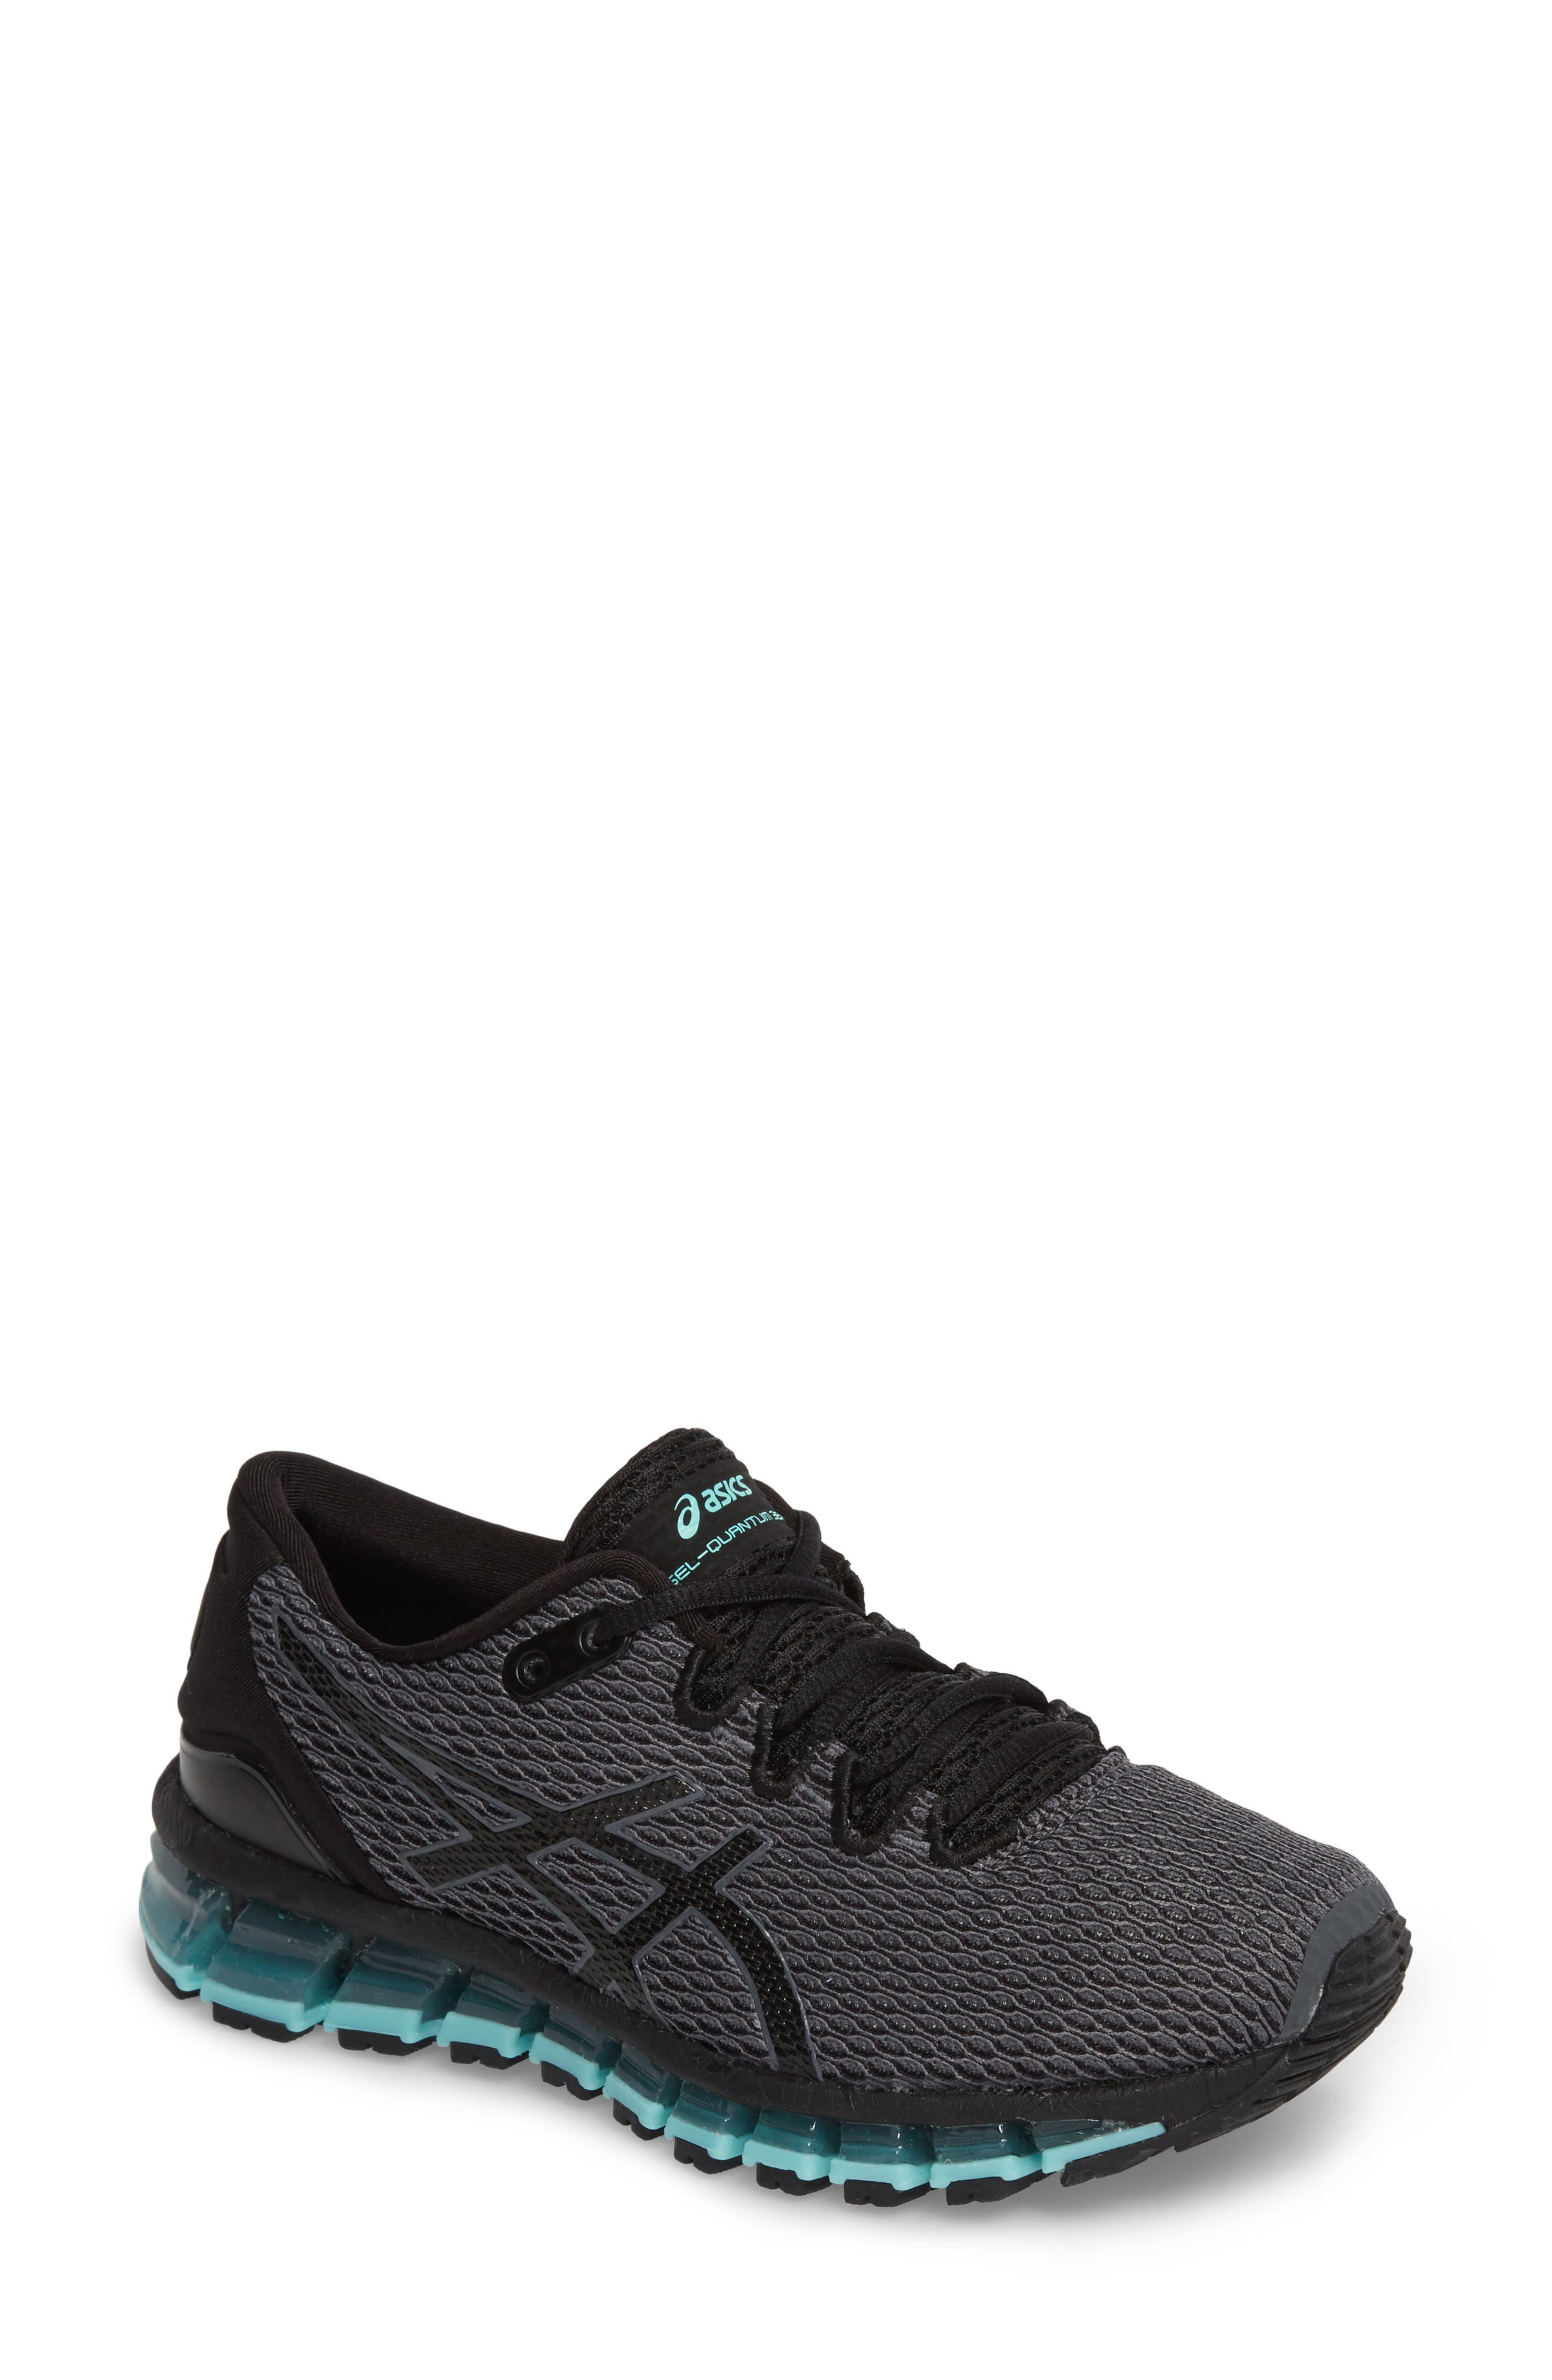 GEL-Quantum 360 Shift MX Running Shoe,                             Main thumbnail 1, color,                             CARBON/ BLACK/ ARUBA BLUE